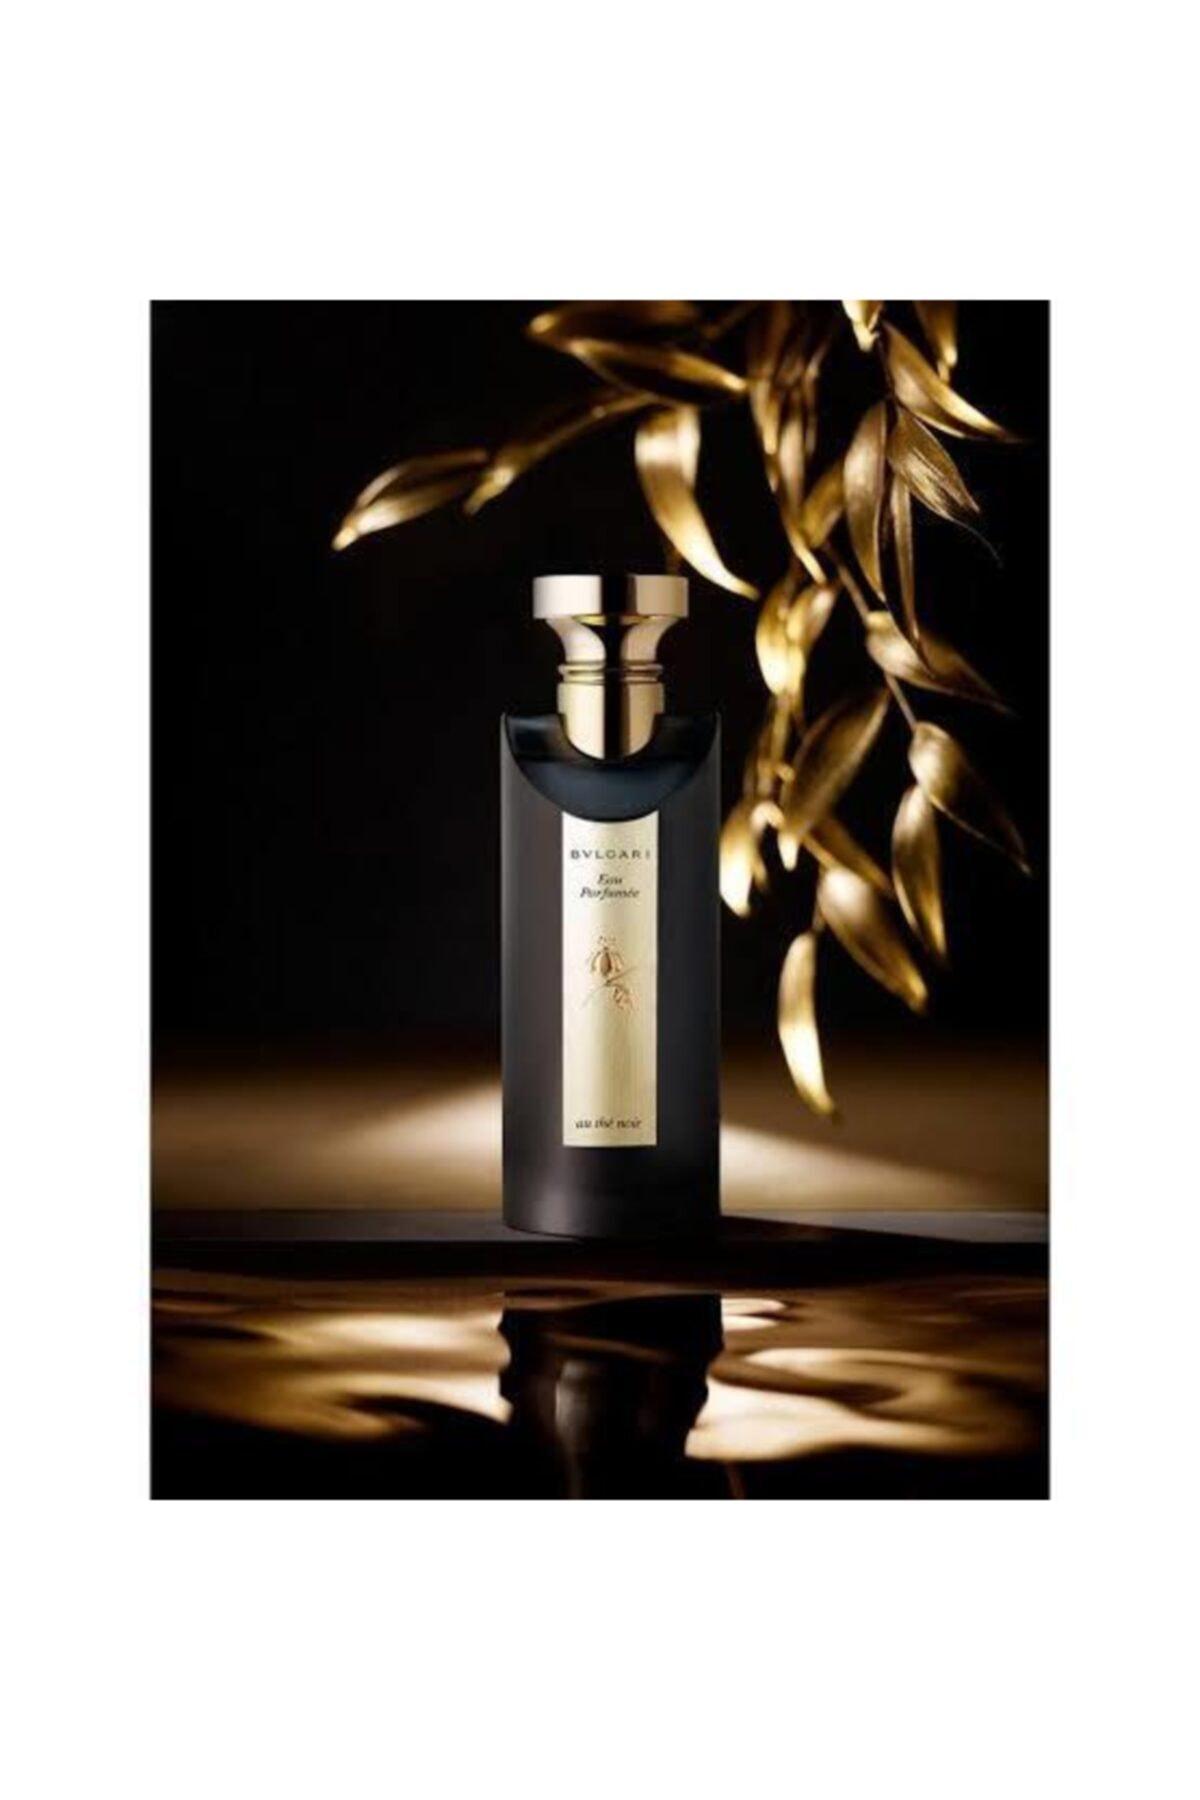 Bvlgari Bvlgarı Eau Parfume The Noır Intense Edc 150ml 2